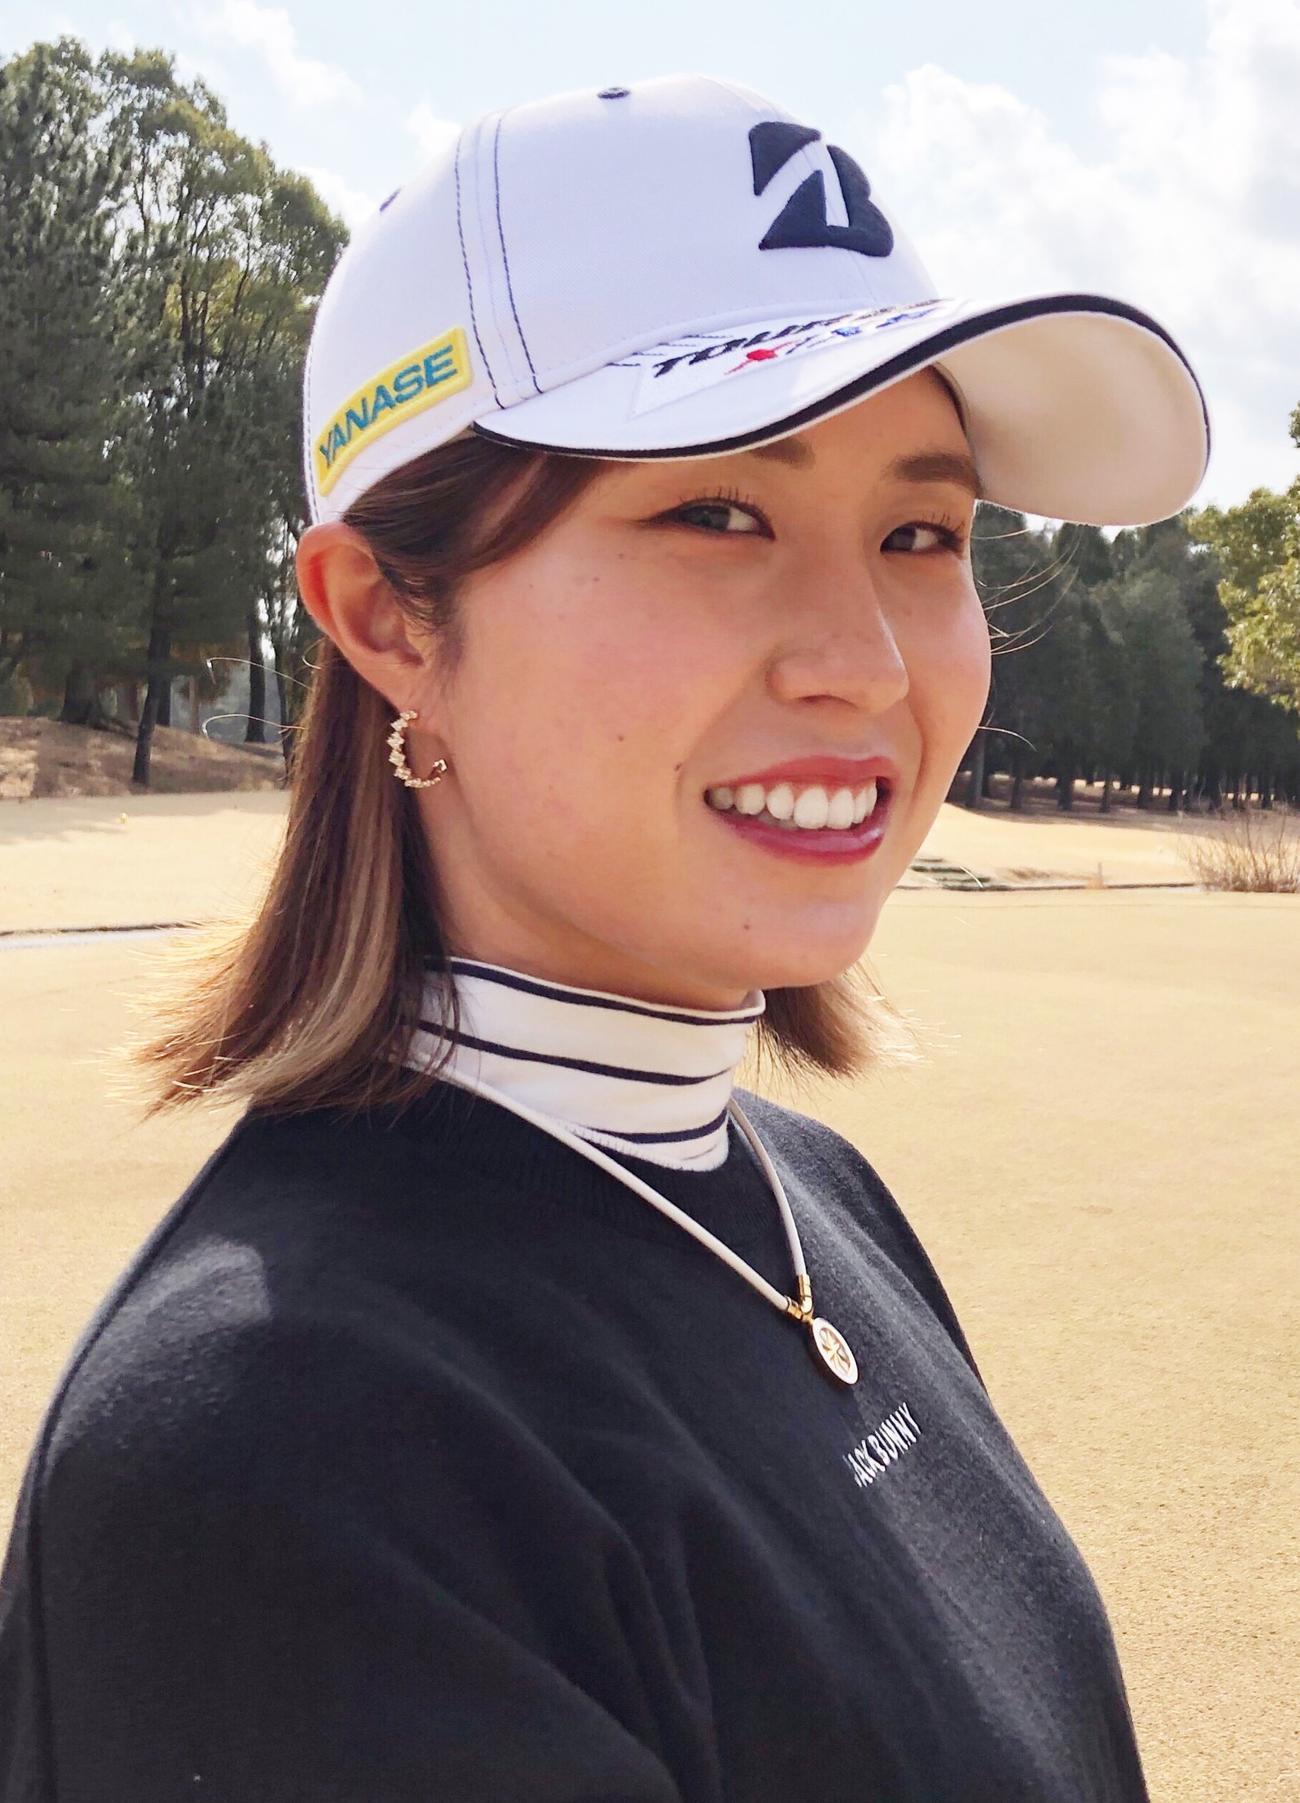 https://www.nikkansports.com/sports/golf/news/img/202102260000277-w1300_1.jpg